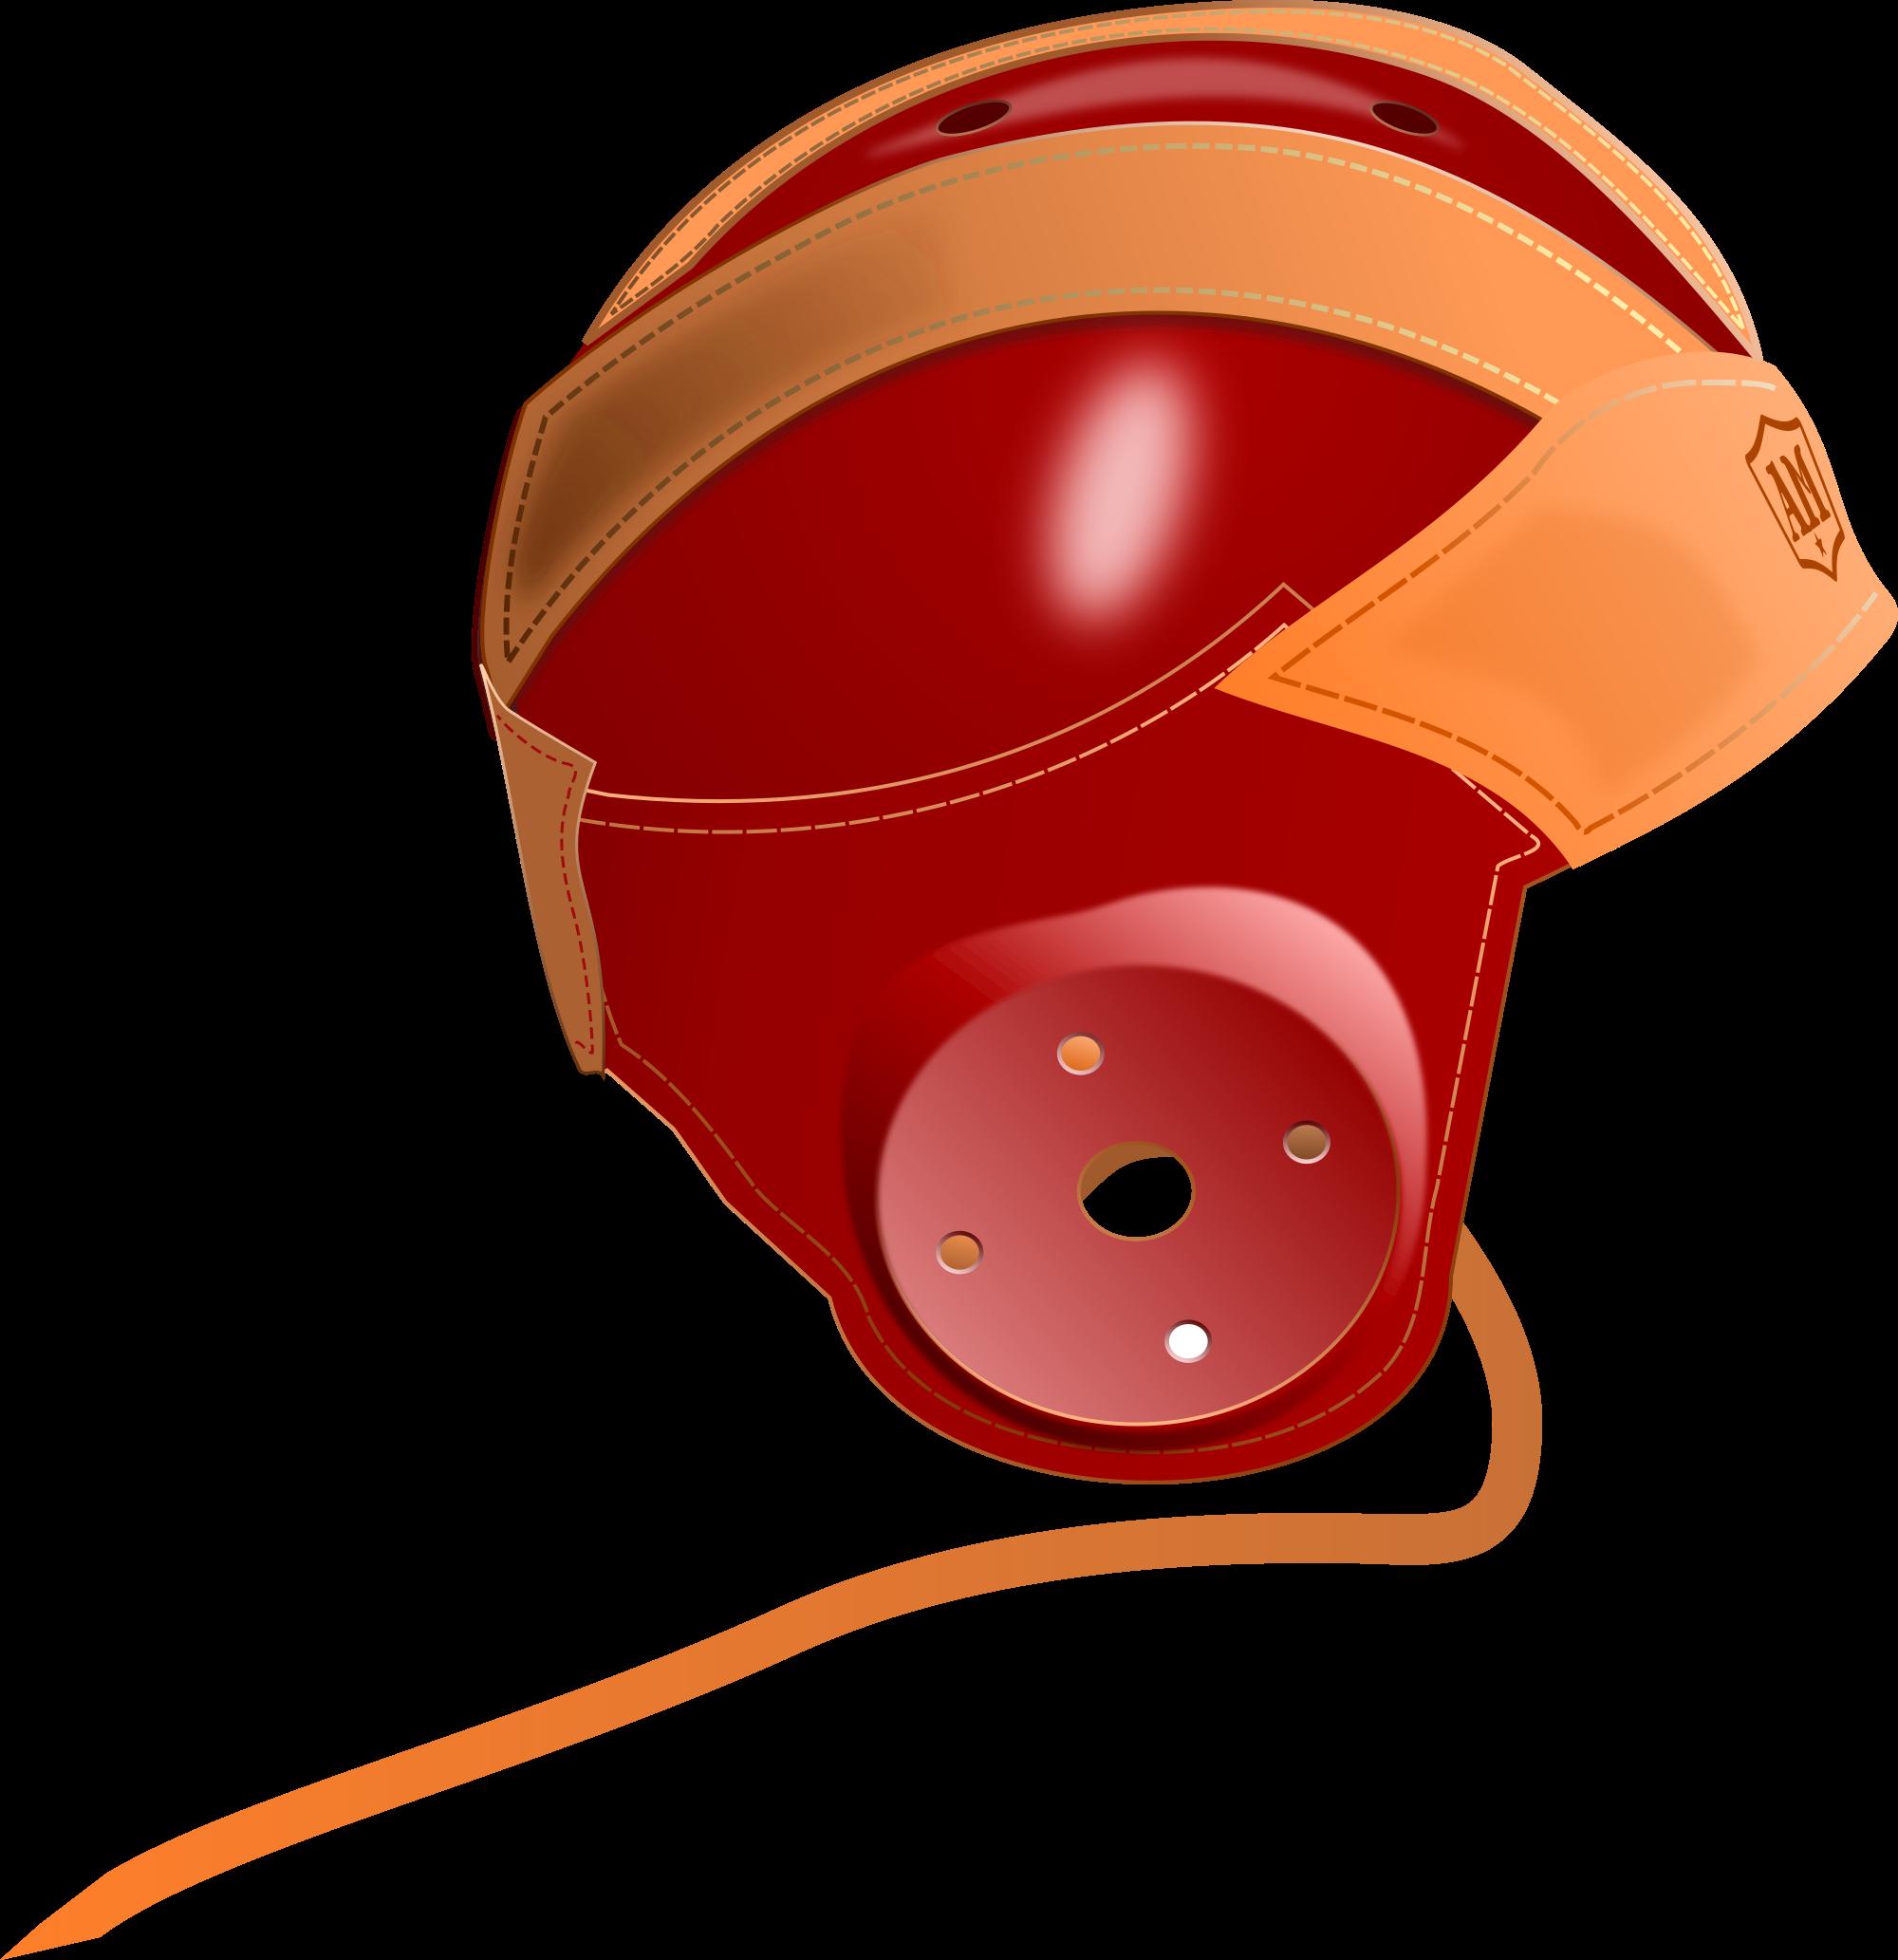 Flying football clipart jpg free Leather head helmet clipart jpg free